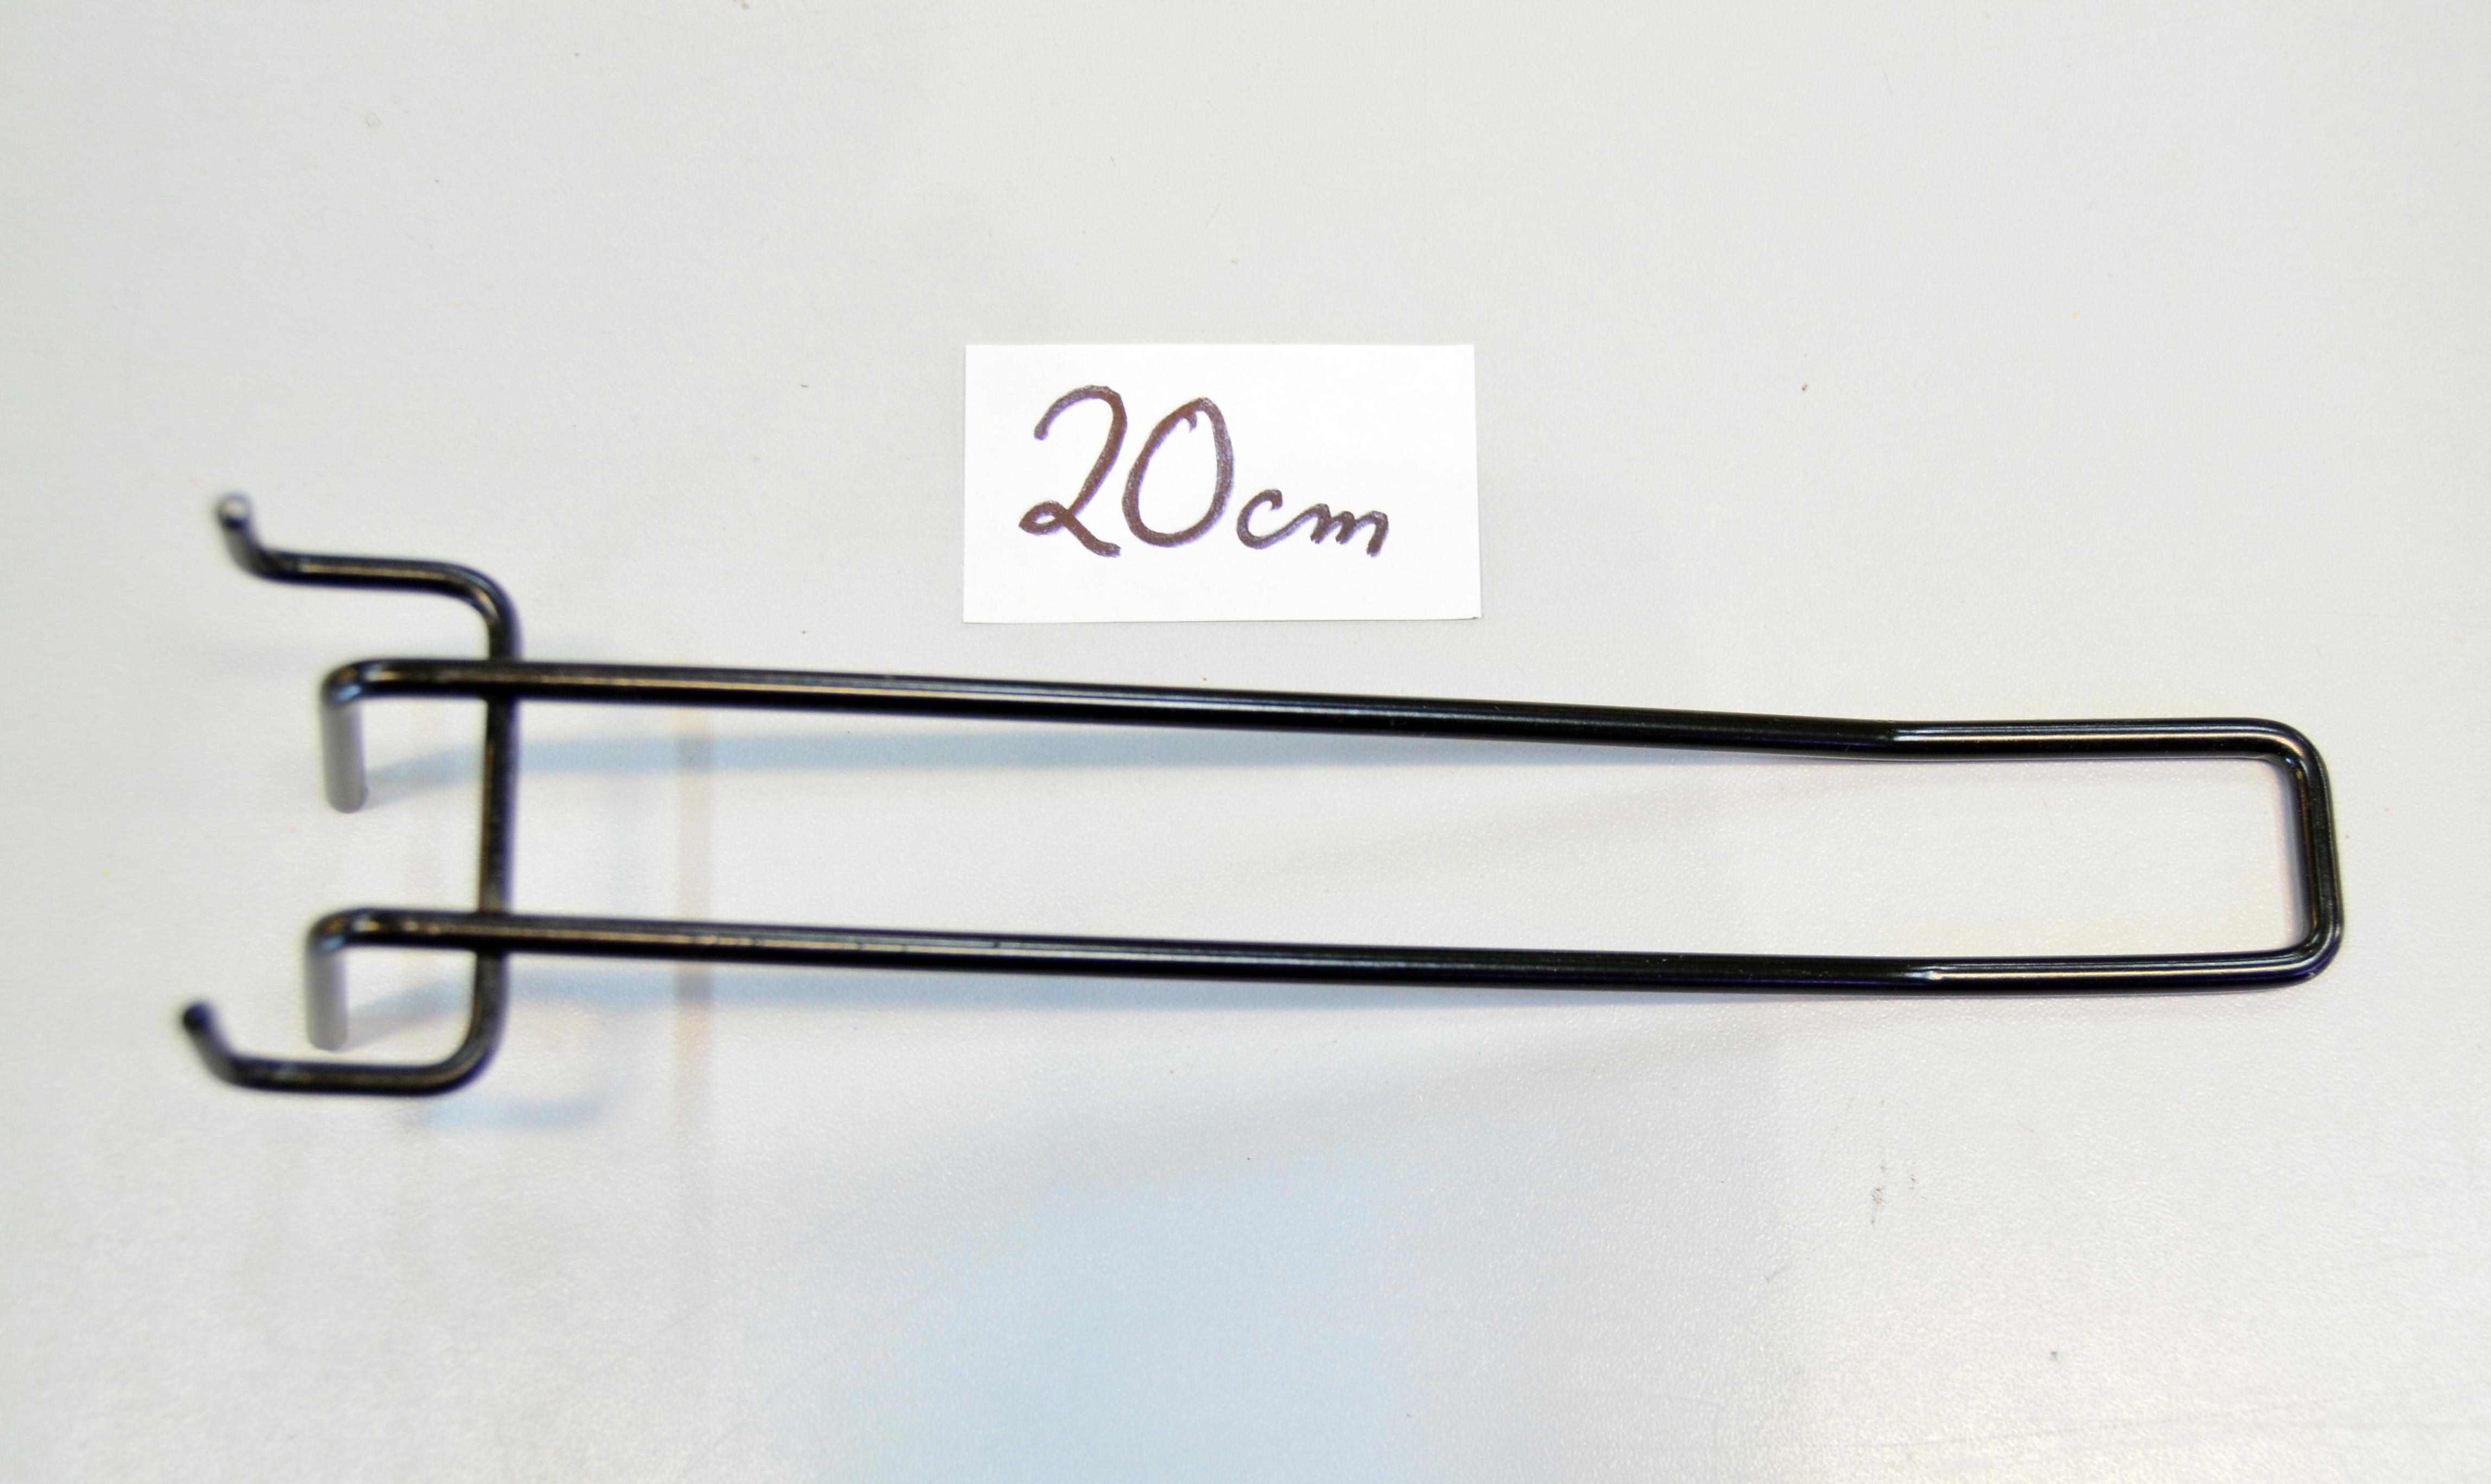 Háček kovový ke stojanu Mivardi Multi - 20cm